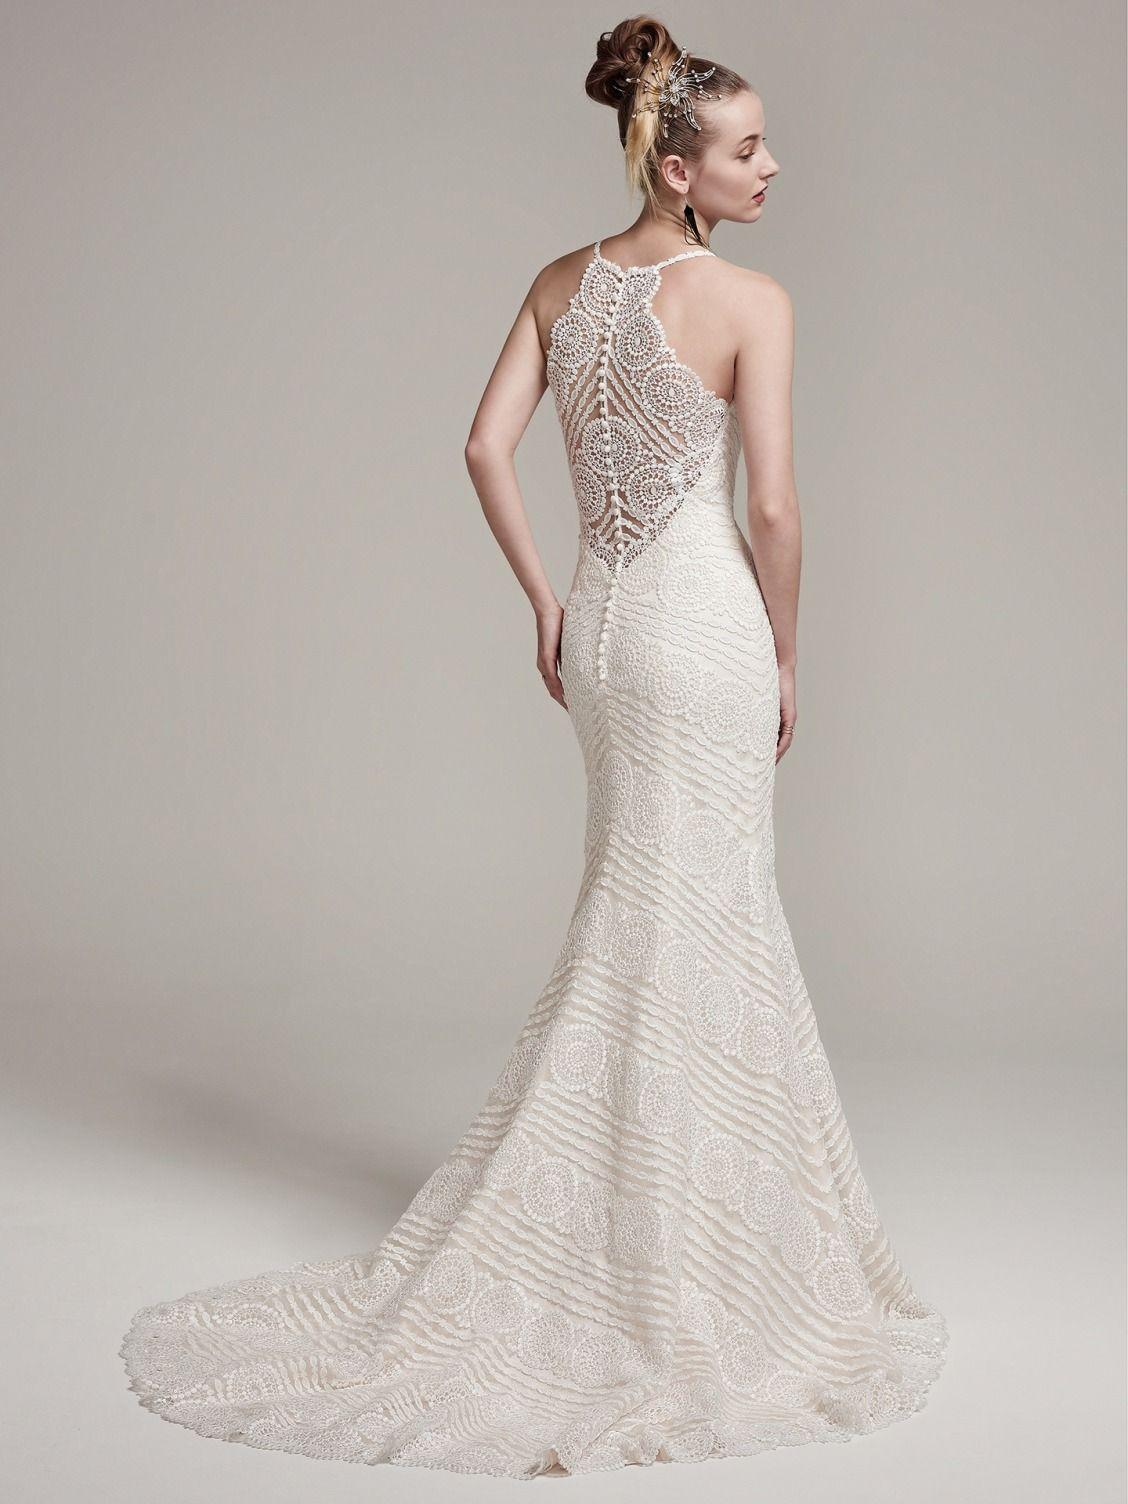 Maggie sottero wedding dresses wedding dress and weddings